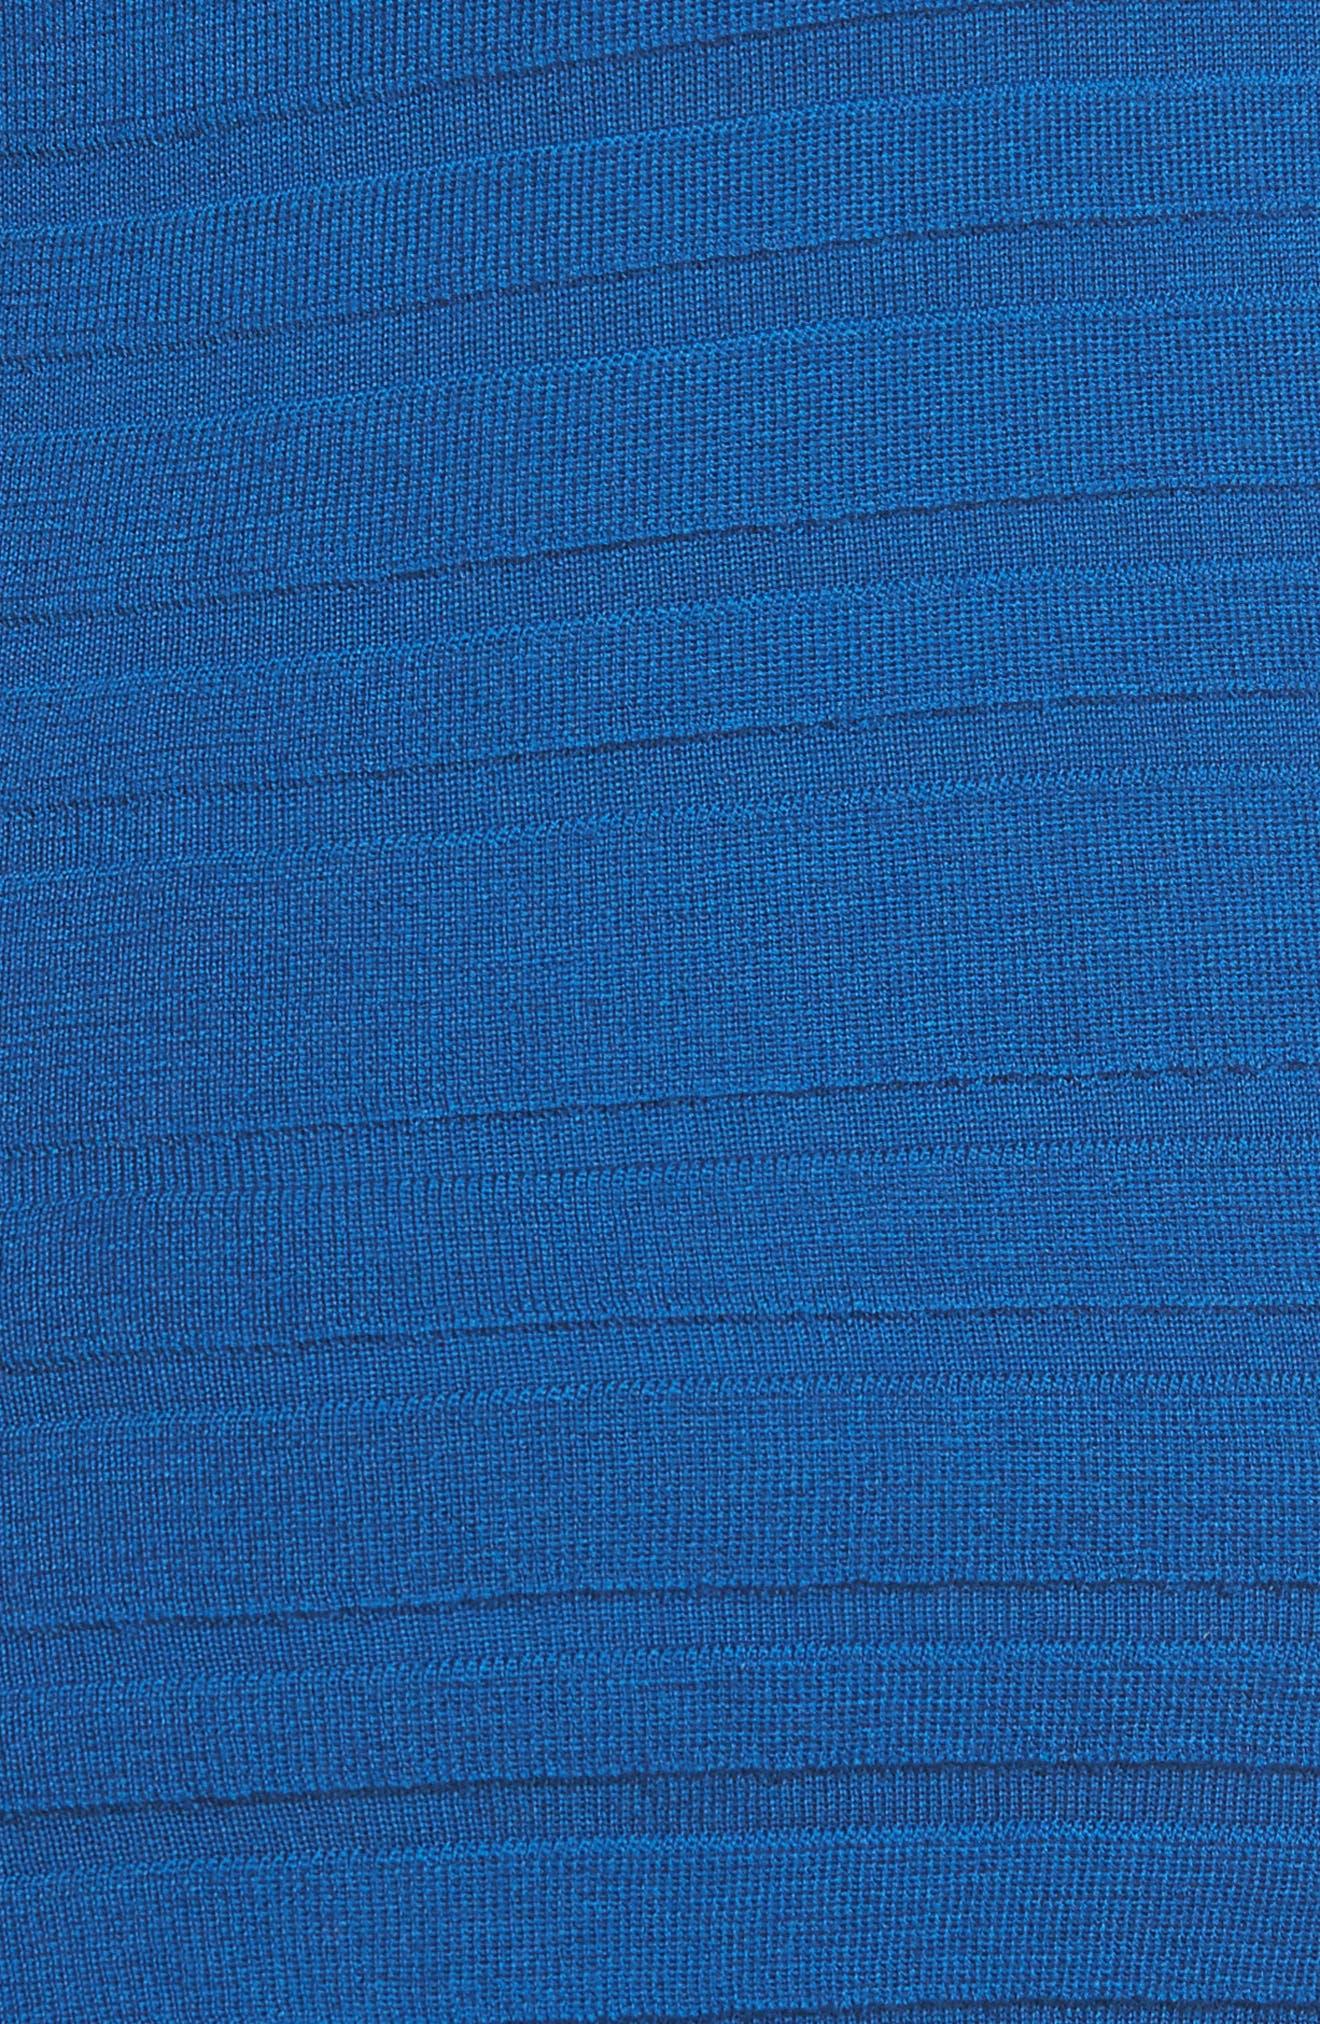 Fahsa Stripe Textured Wool Cardigan,                             Alternate thumbnail 5, color,                             Gentian Blue